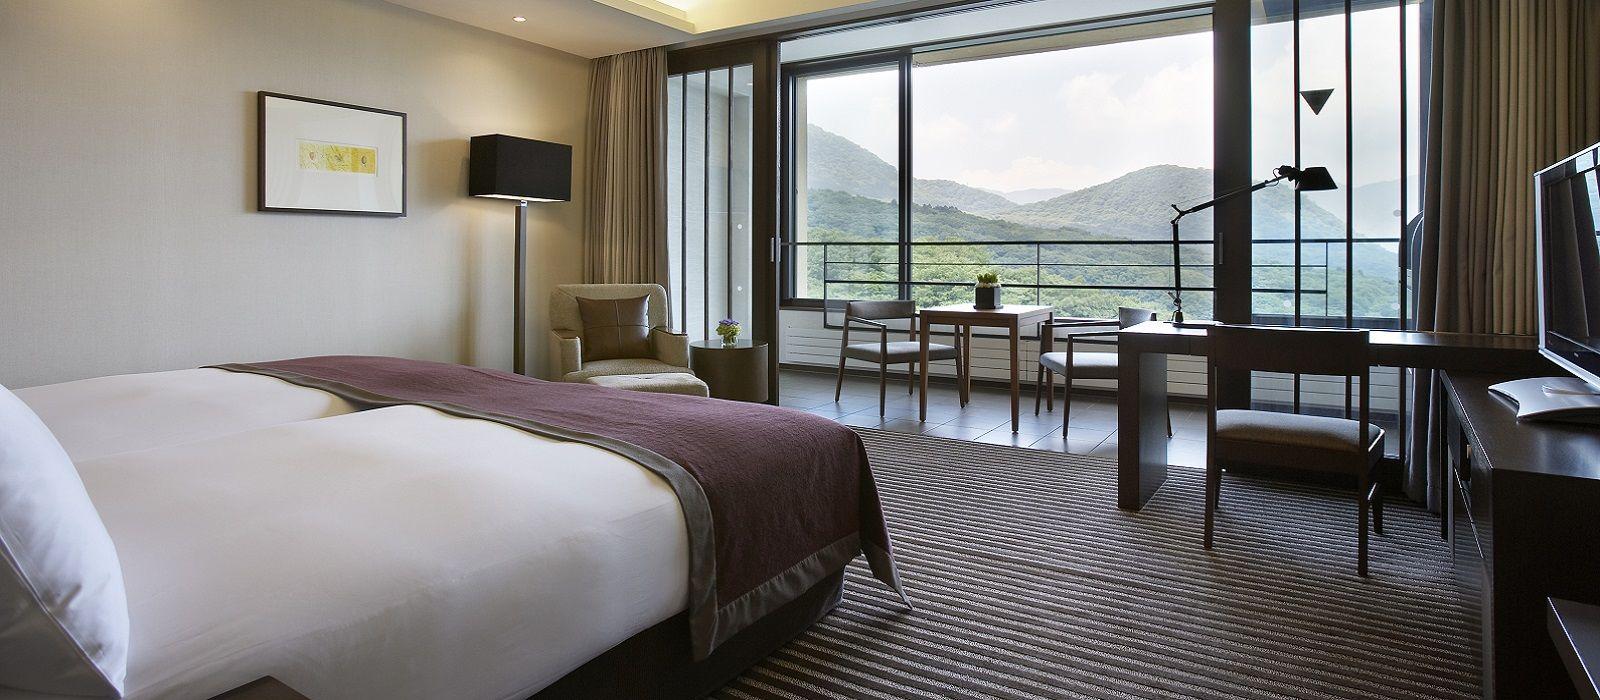 Hotel Hyatt Regency Hakone Resort and Spa Japan